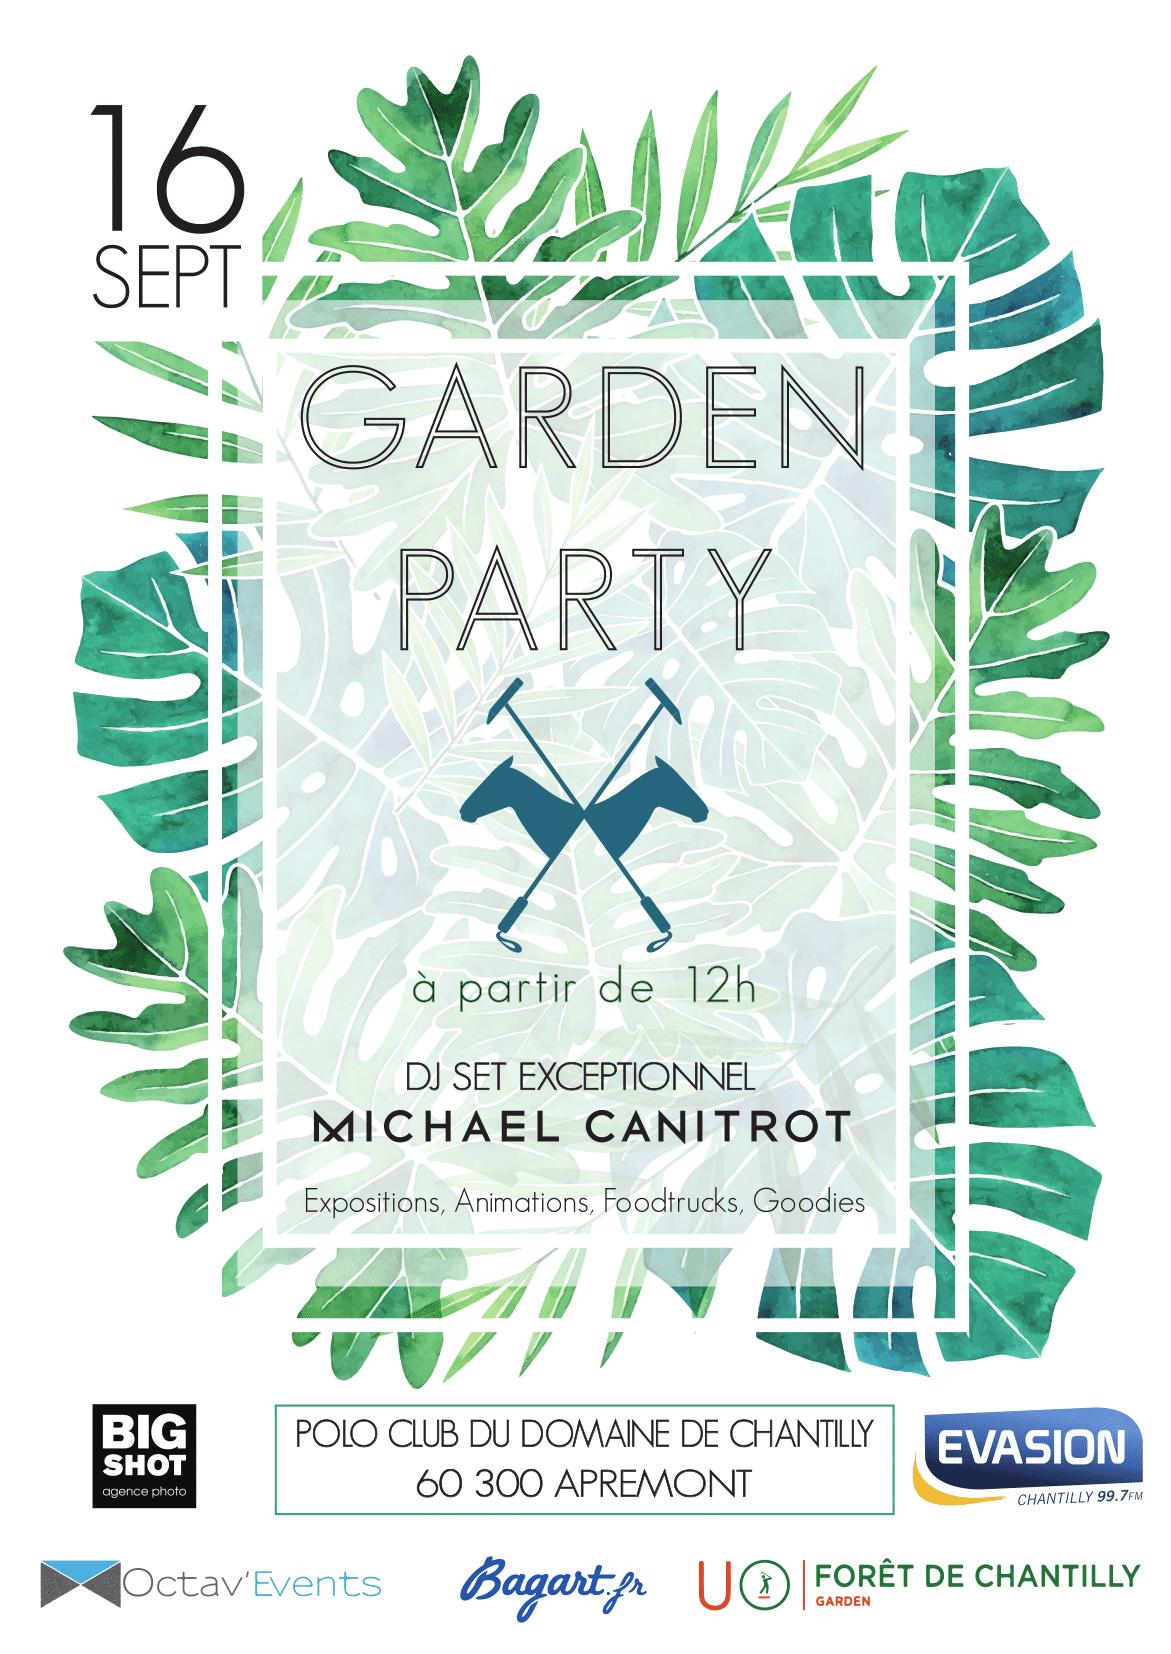 garden-party-fete-fiesta-dj-michael-canitrot-polo-chantilly-event